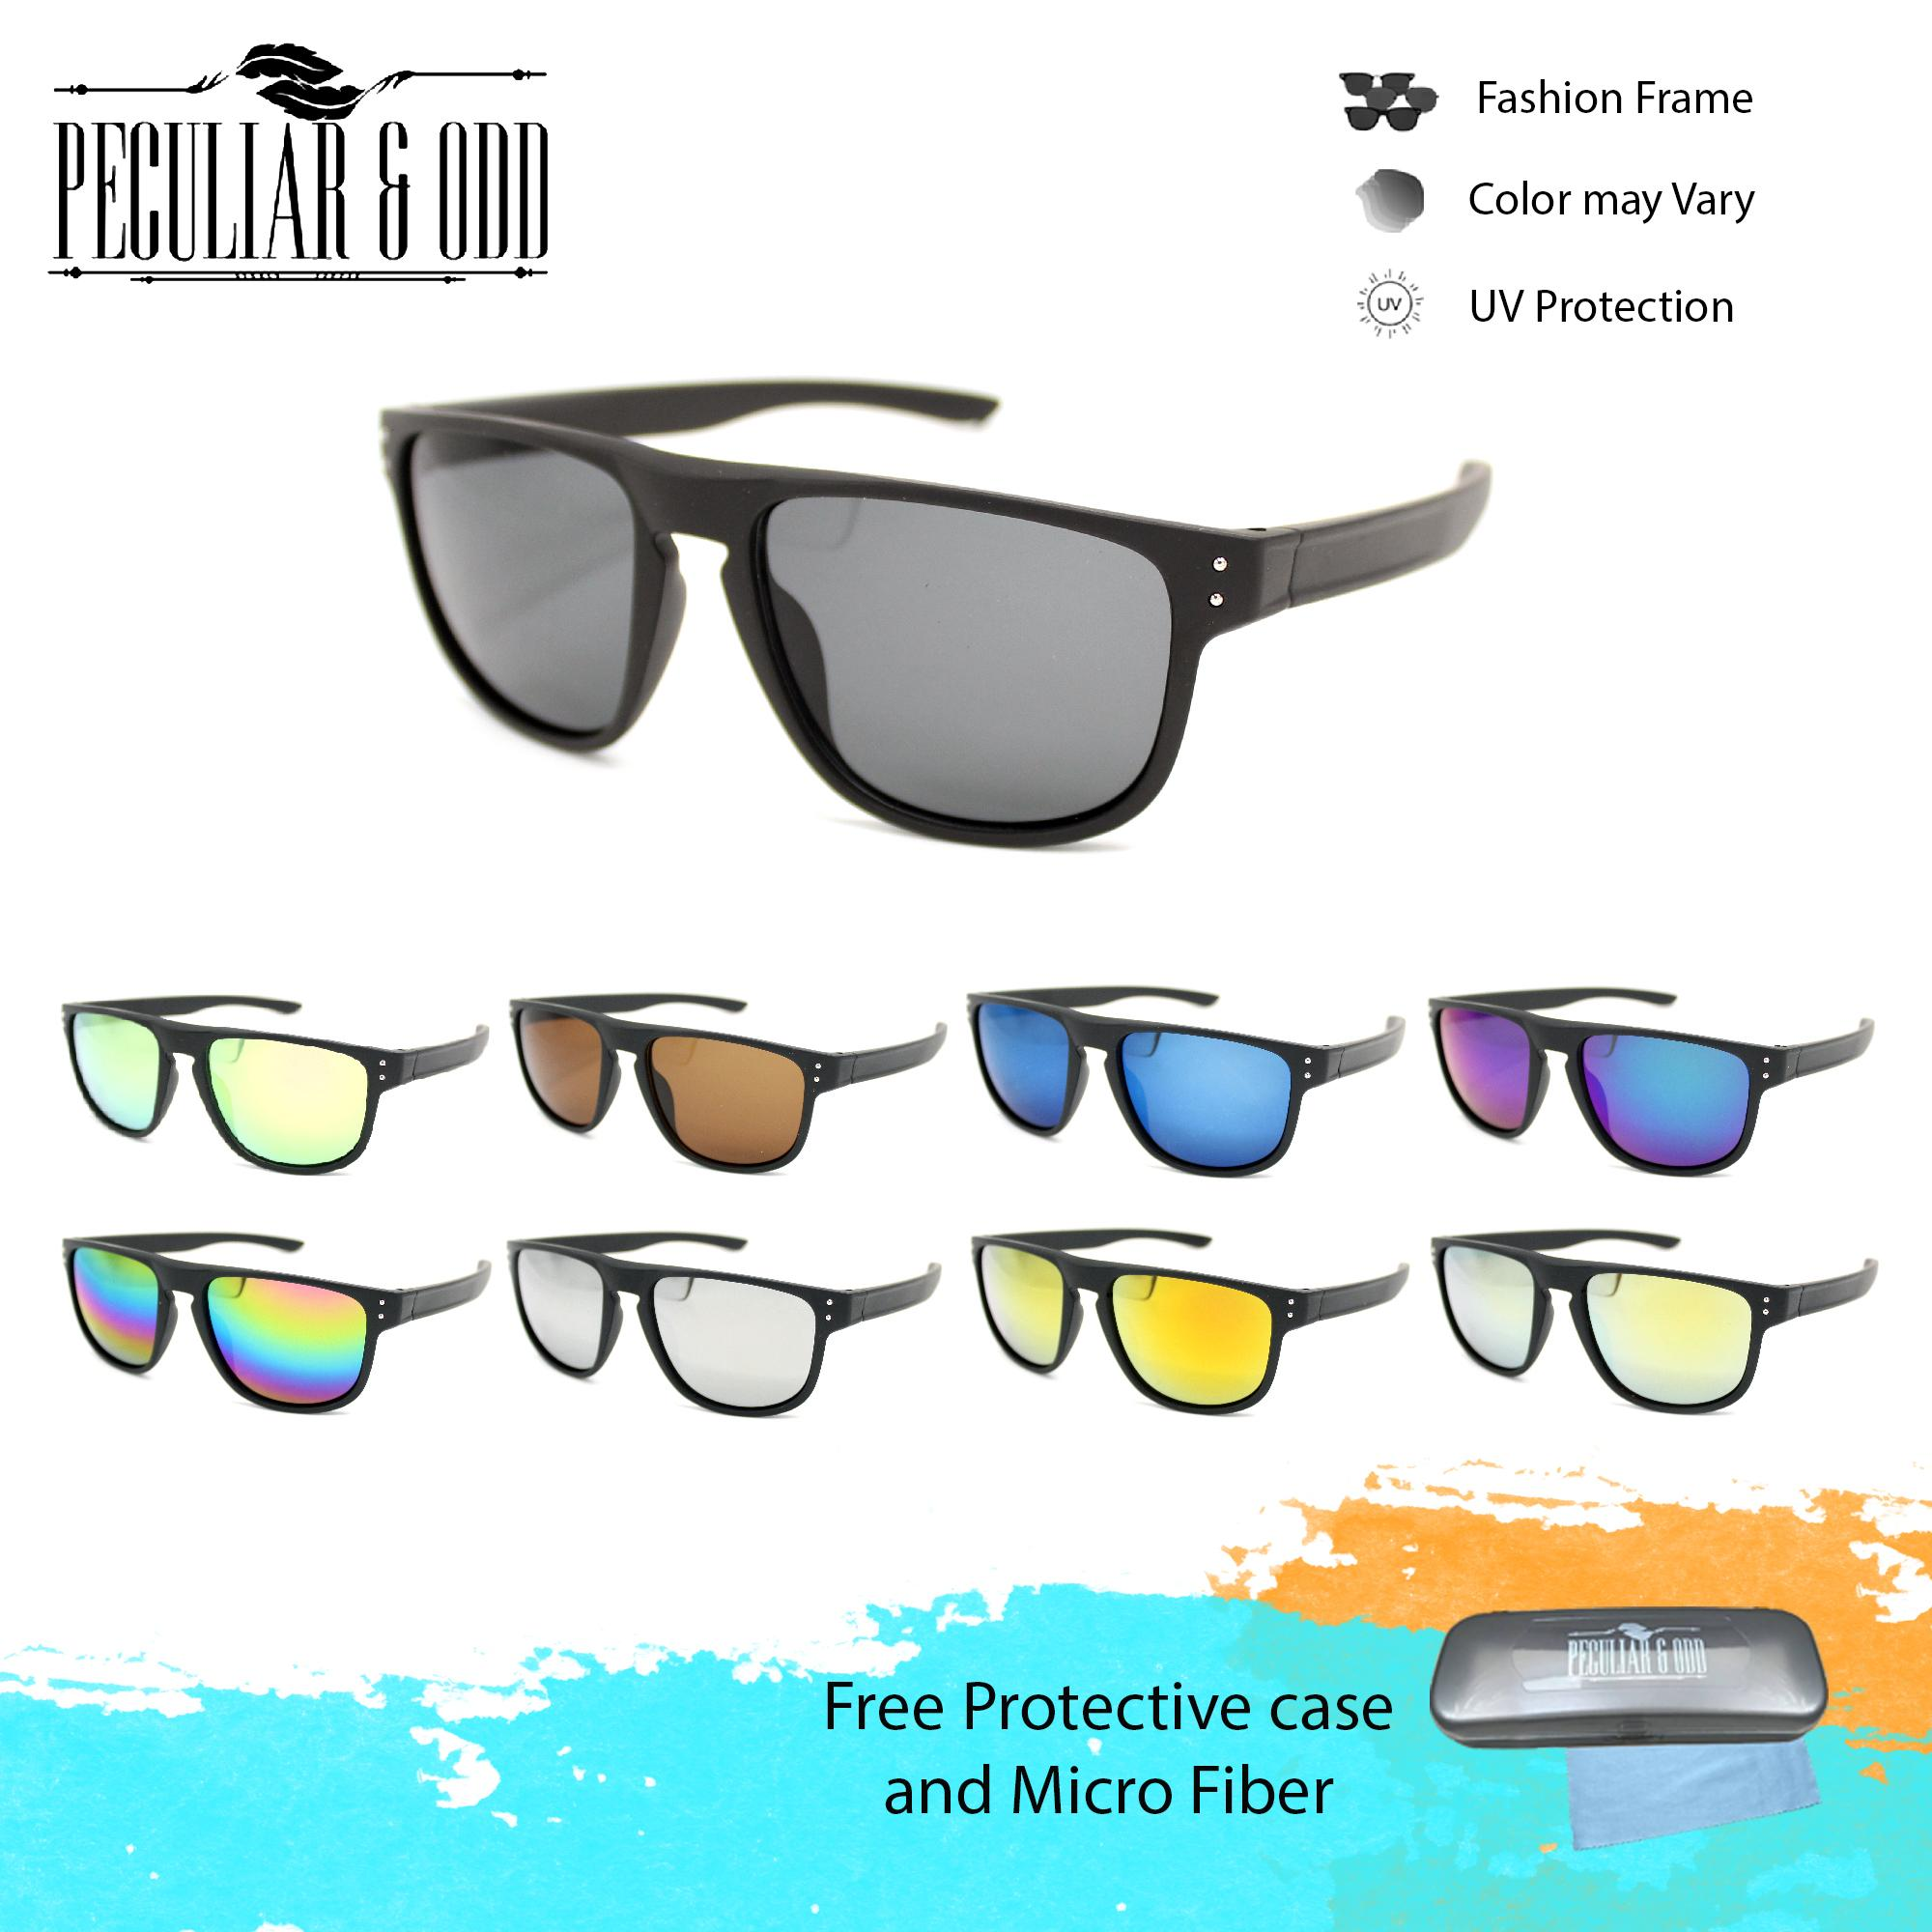 0728be5a3b Peculiar Classic 2520 Unisex UV Protection Full Rim Sunglasses